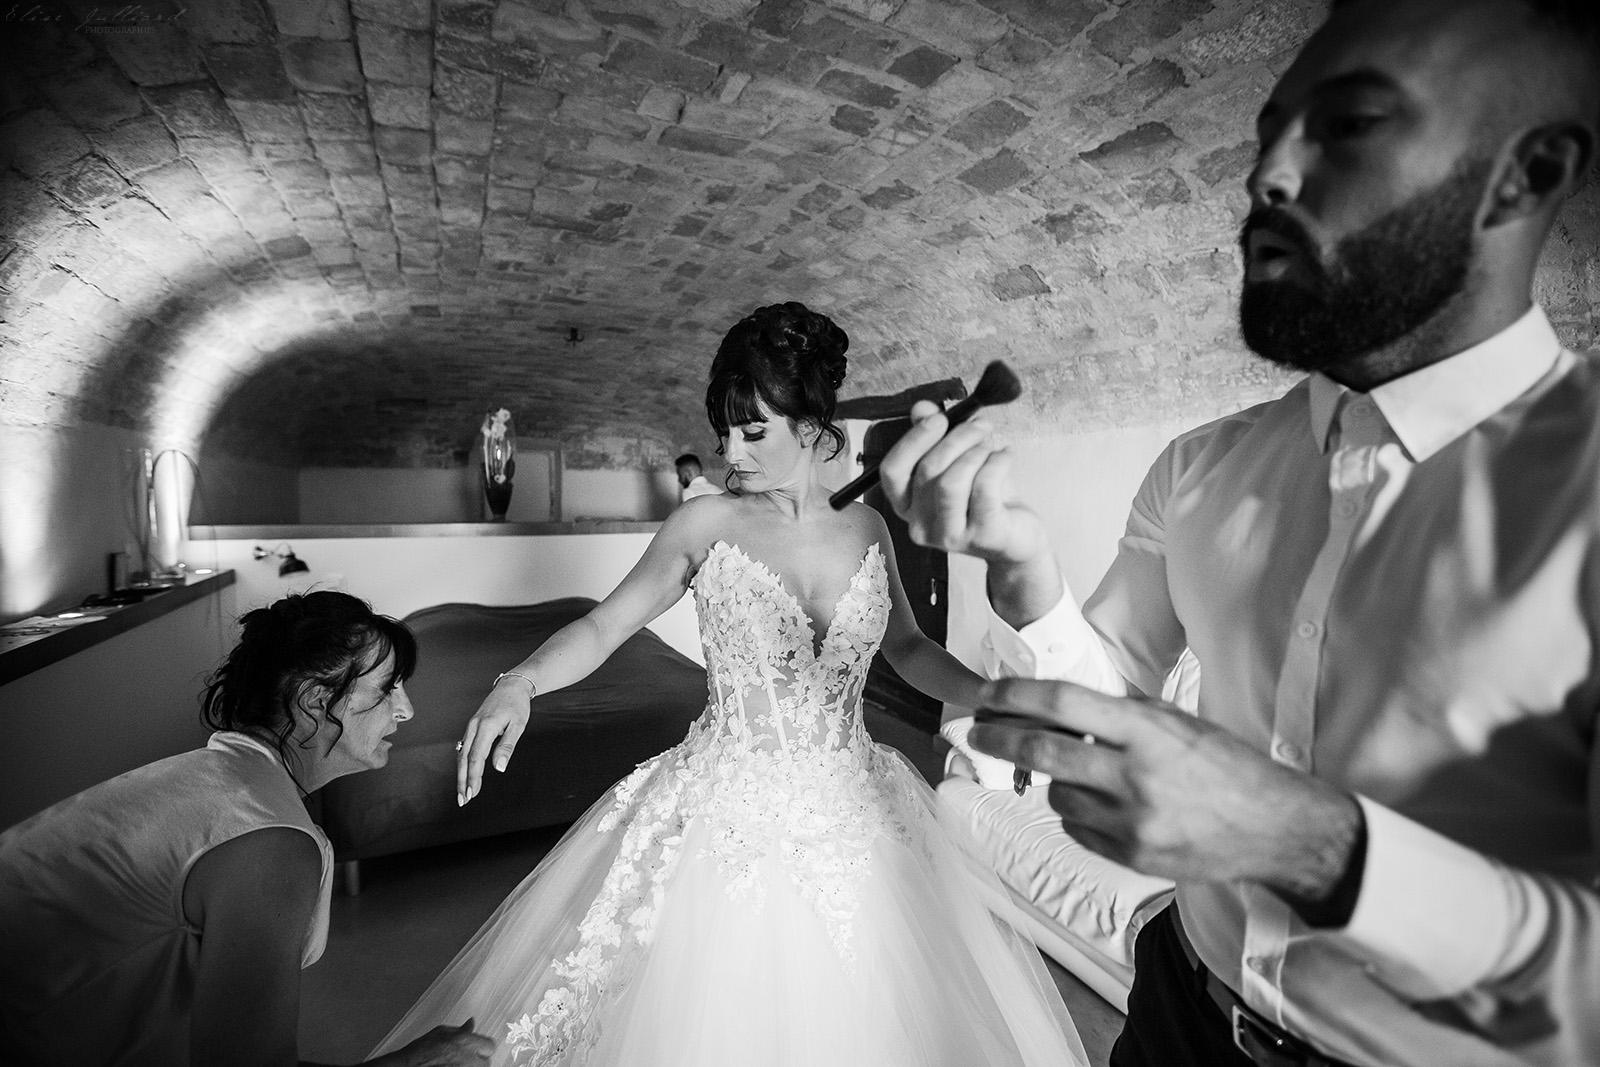 mariage-nimes-provence-alpes-cote-azue-languedoc-occitanie-domaine-la-baraque-de-serignac-alliances-olivier-wedding-reportage-seance-photo-couple-elise-julliard-photographe-4